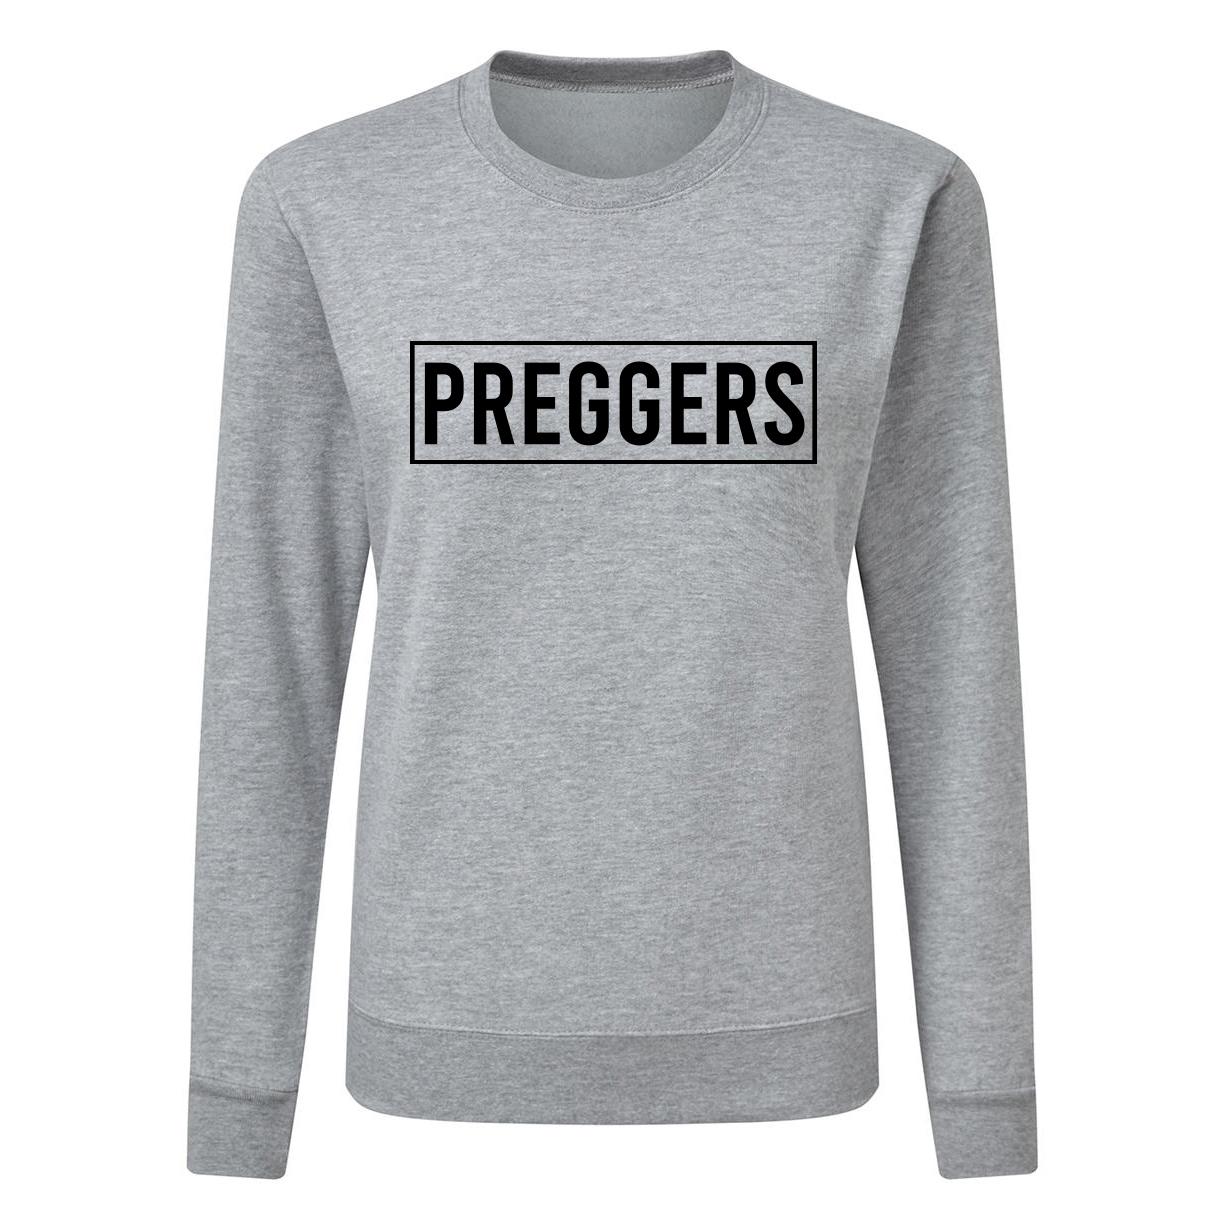 Sweater - Preggers